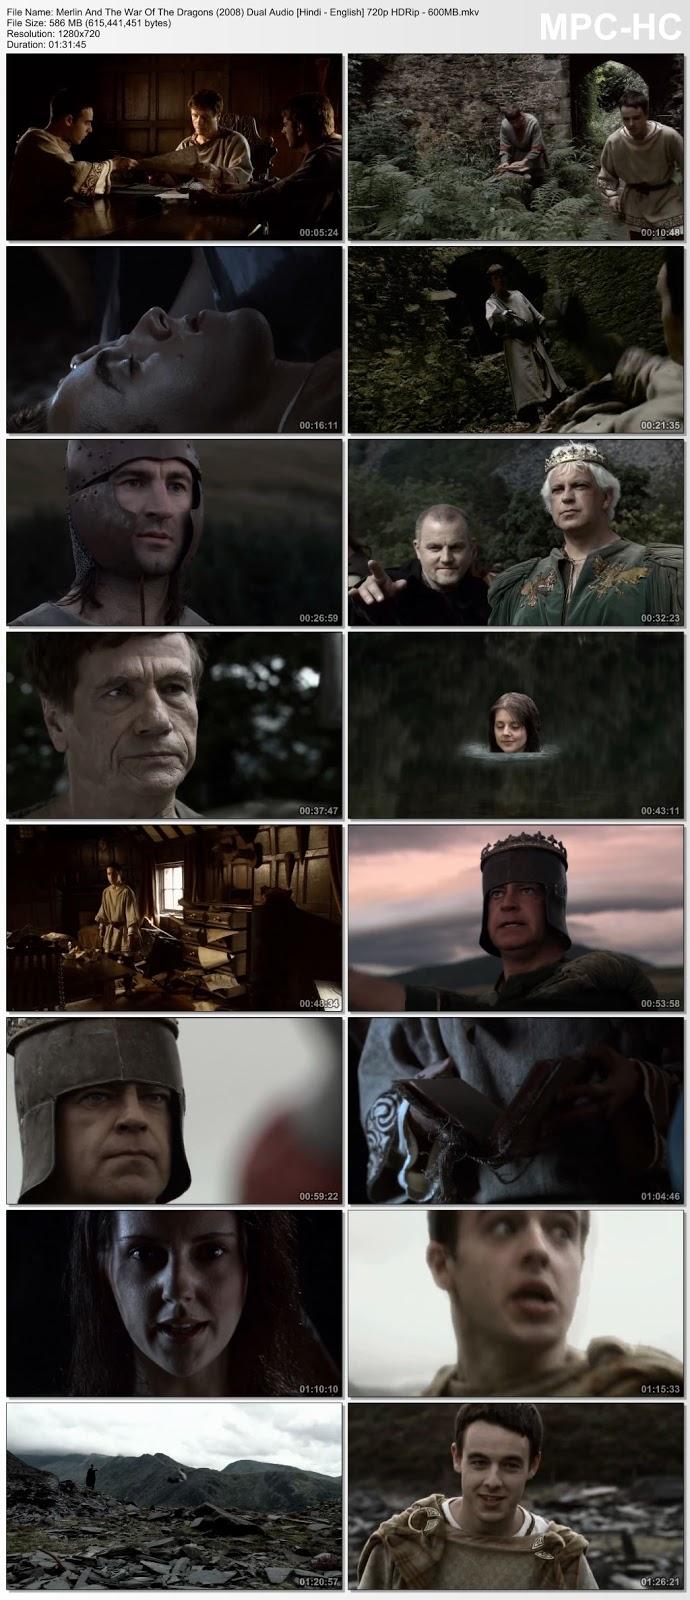 Merlin And The War Of The Dragons (2008) [Hindi – English] 720p HDRip 600MB Desirehub